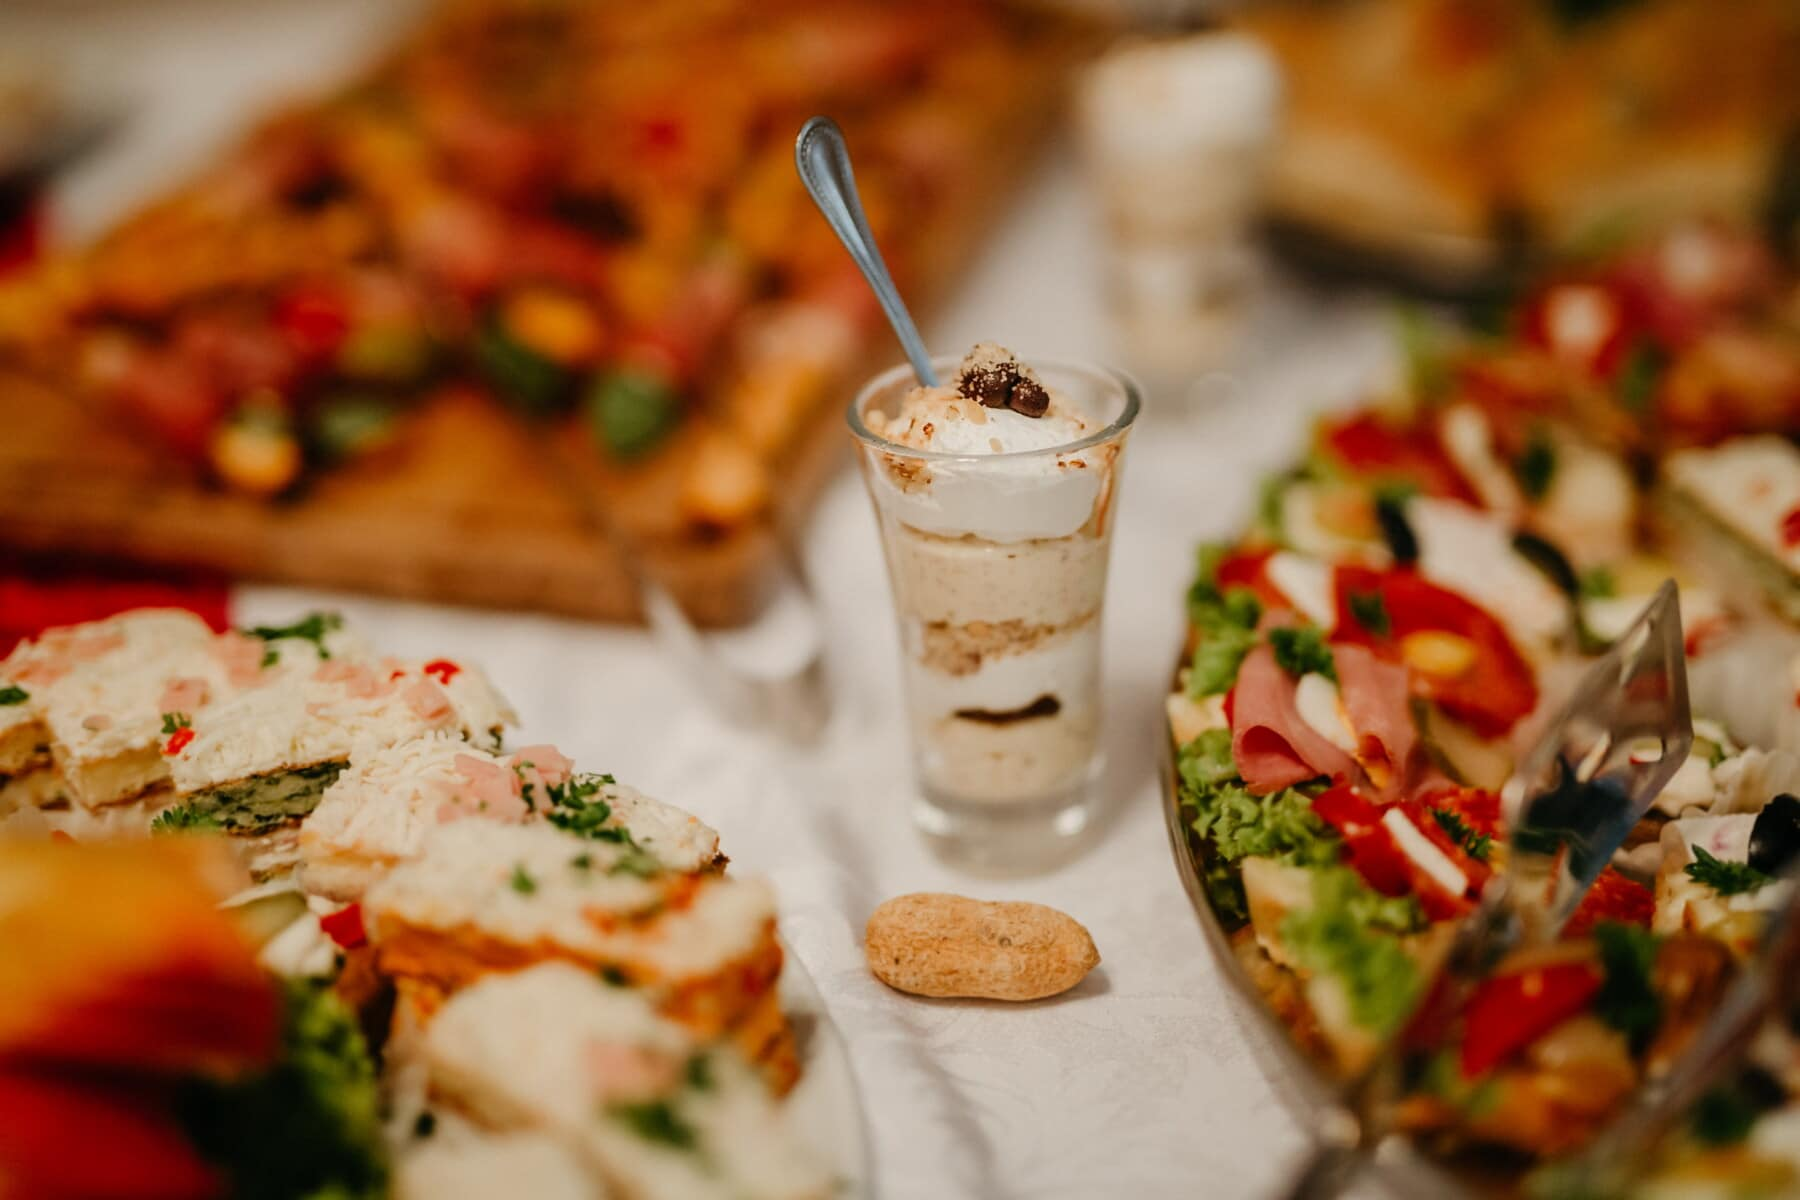 ontbijtbuffet, salade, pudding, crème, glas, feestzaal, restaurant, diner, voedsel, voorgerecht